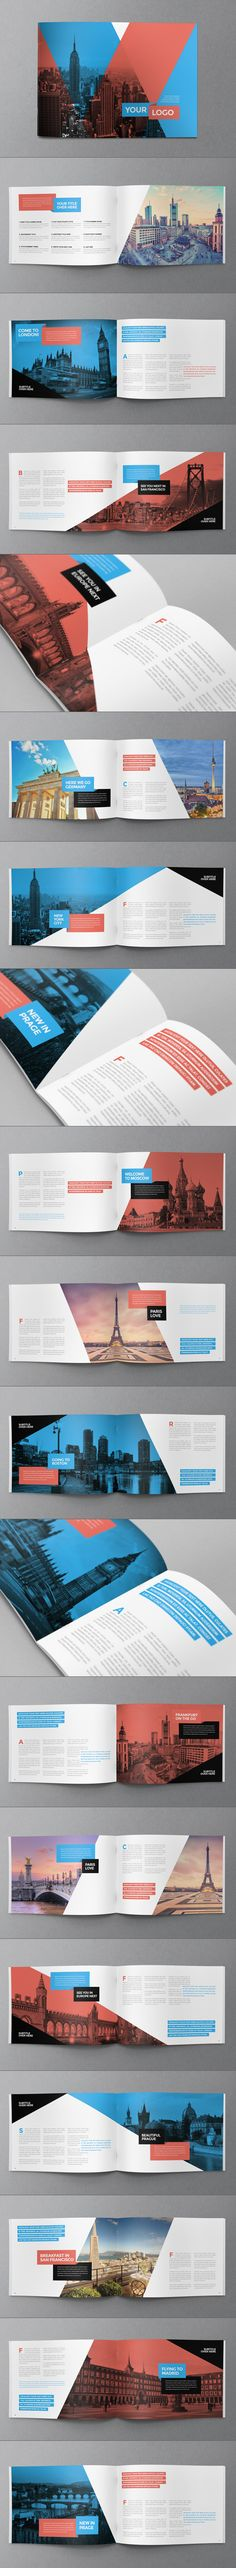 Modern Travel Brochure. Download here: http://graphicriver.net/item/modern-travel-brochure/8753153?ref=abradesign #brochure #design